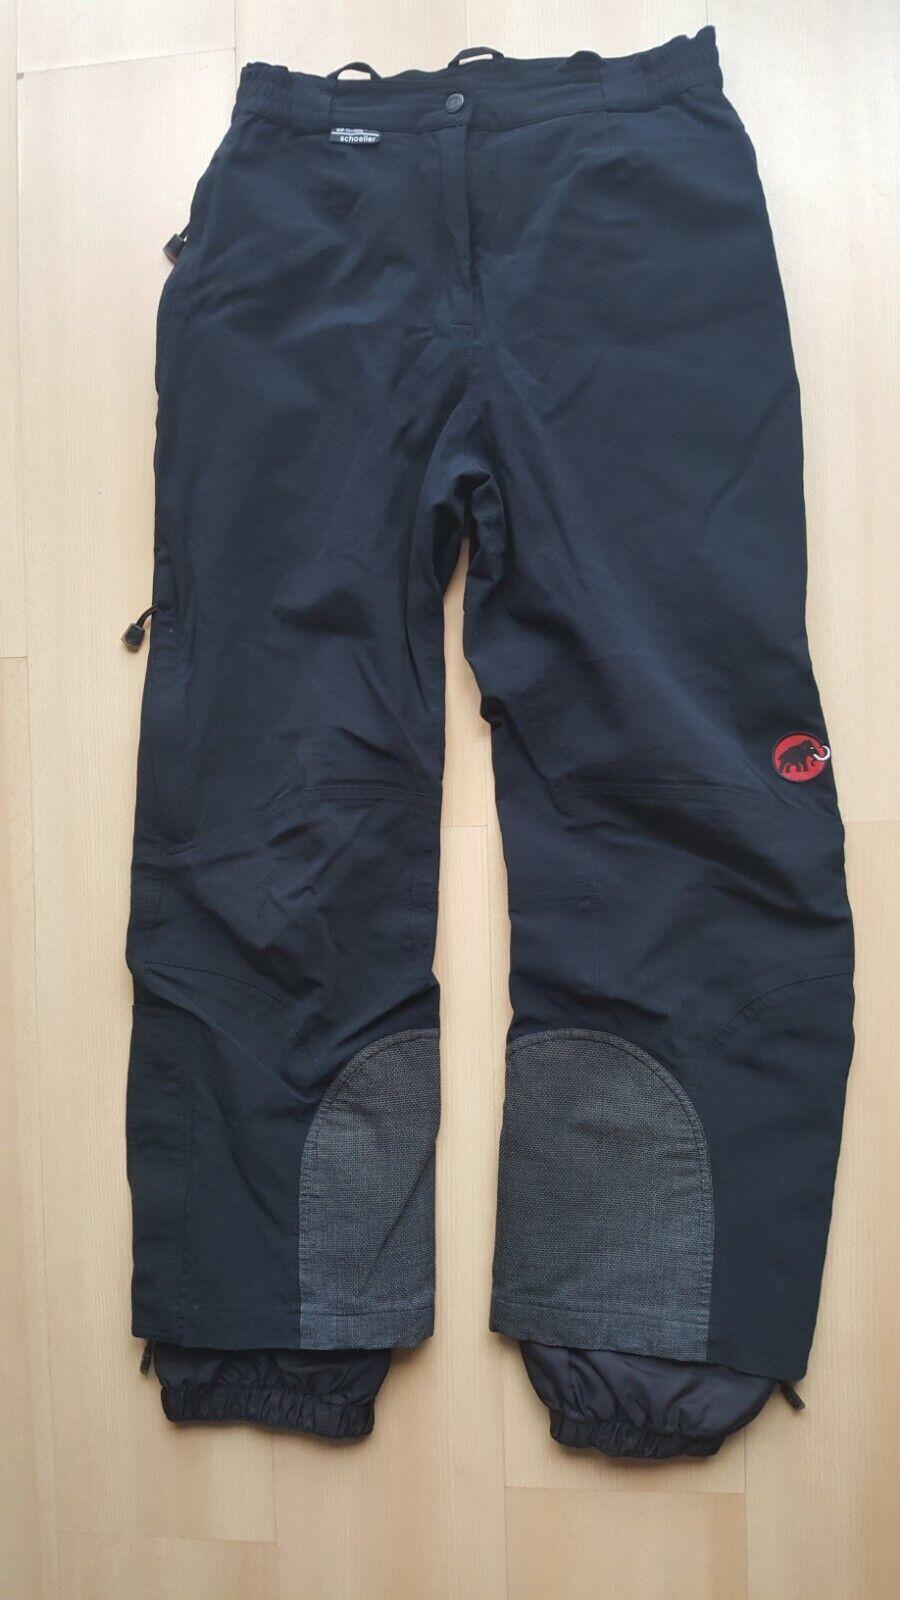 Mammut Hiking Hose Softshell Trekking Ski Schoeller Trousers daSie SIze EU40